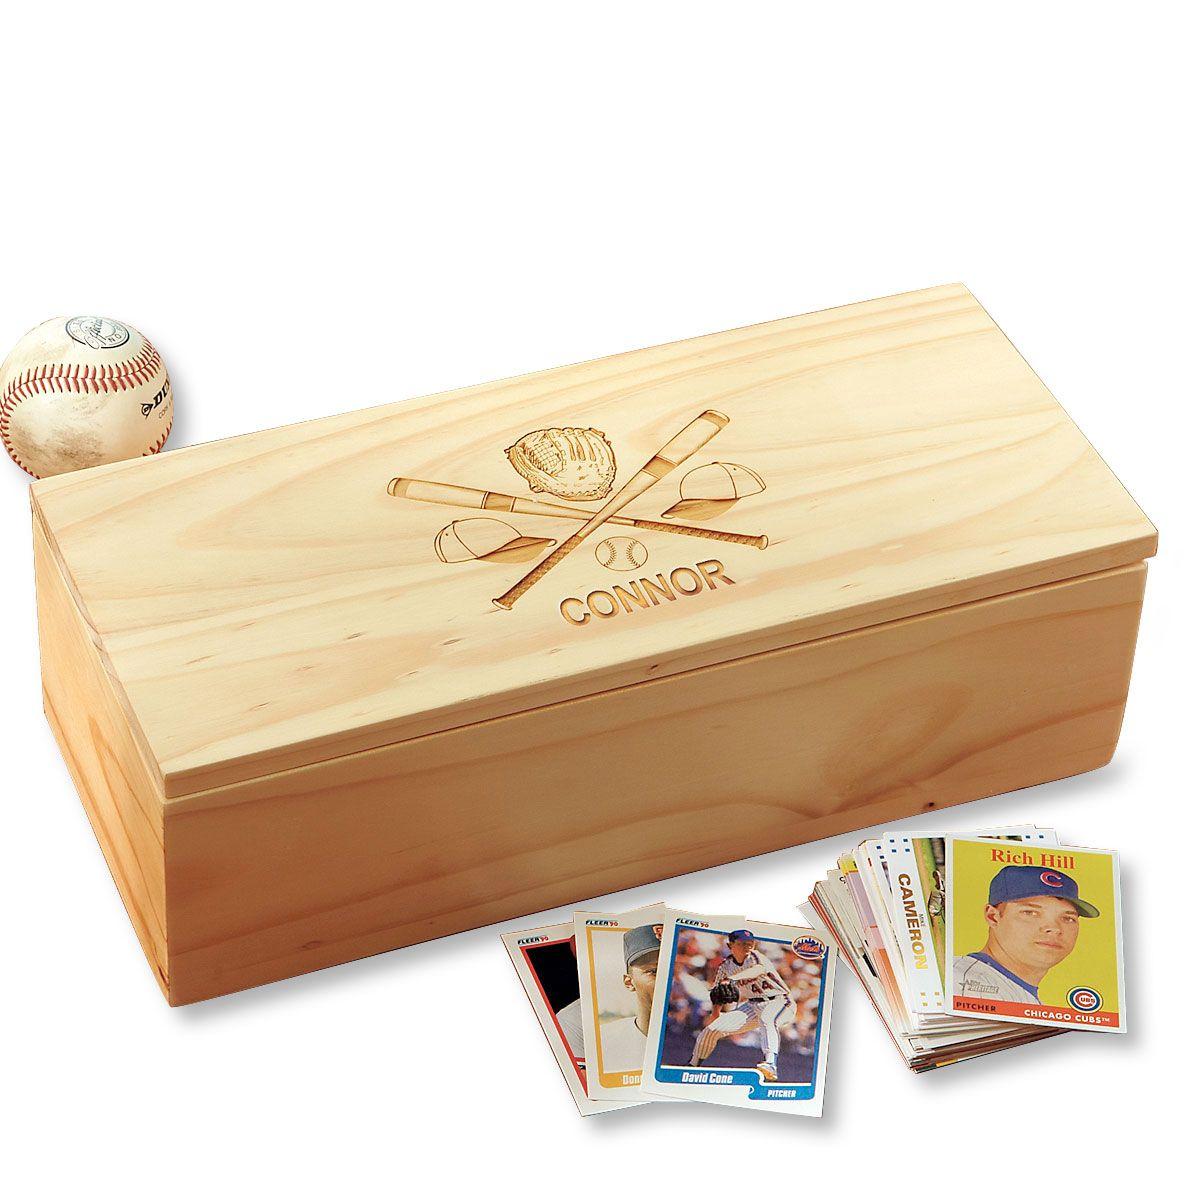 Crossed Bats Personalized Baseball Card Storage Box